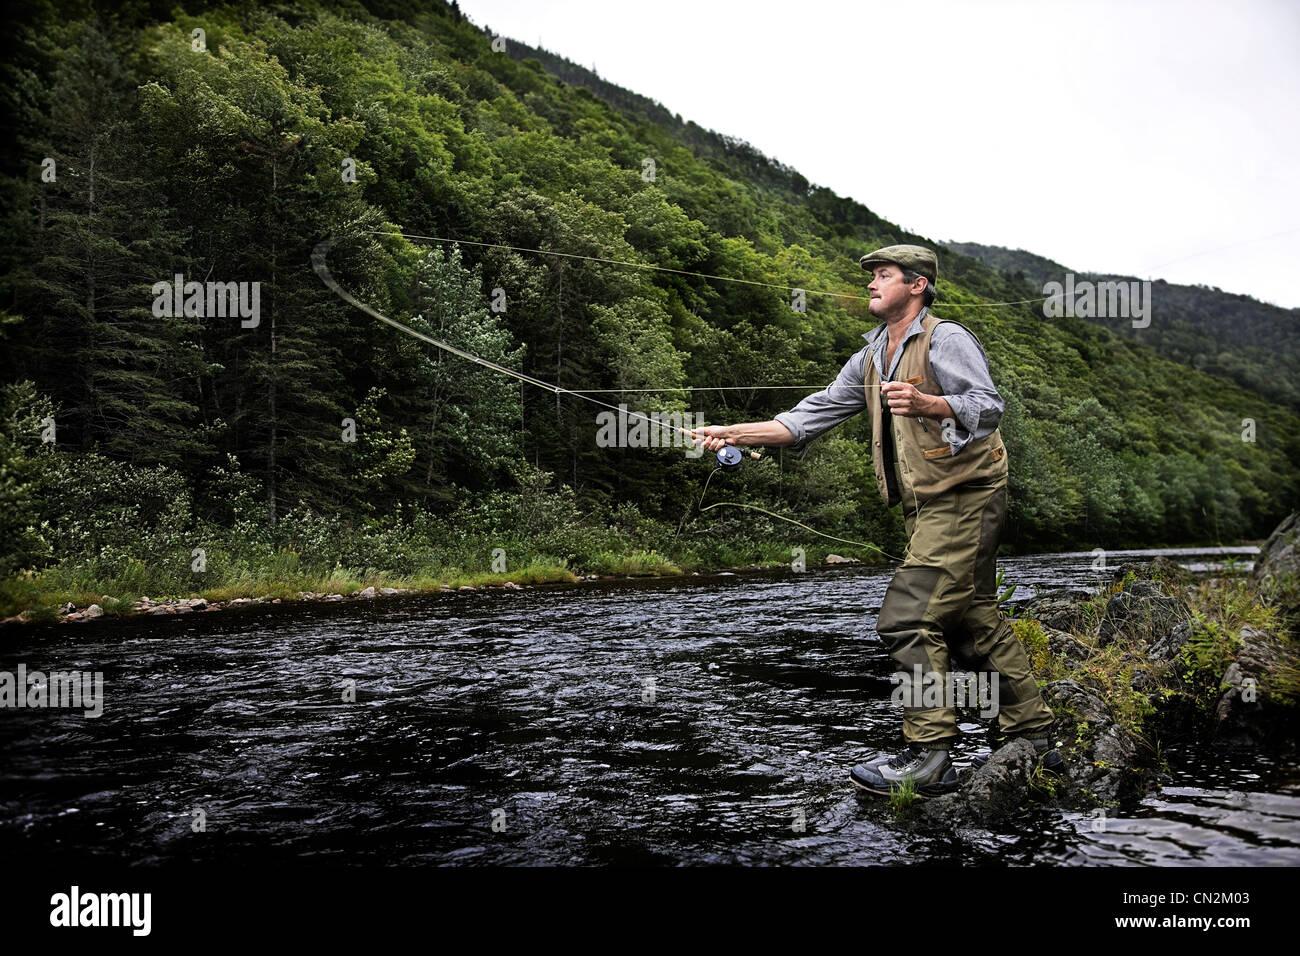 Fly fisherman in Margaree River, Cape Breton Island, Nova Scotia - Stock Image